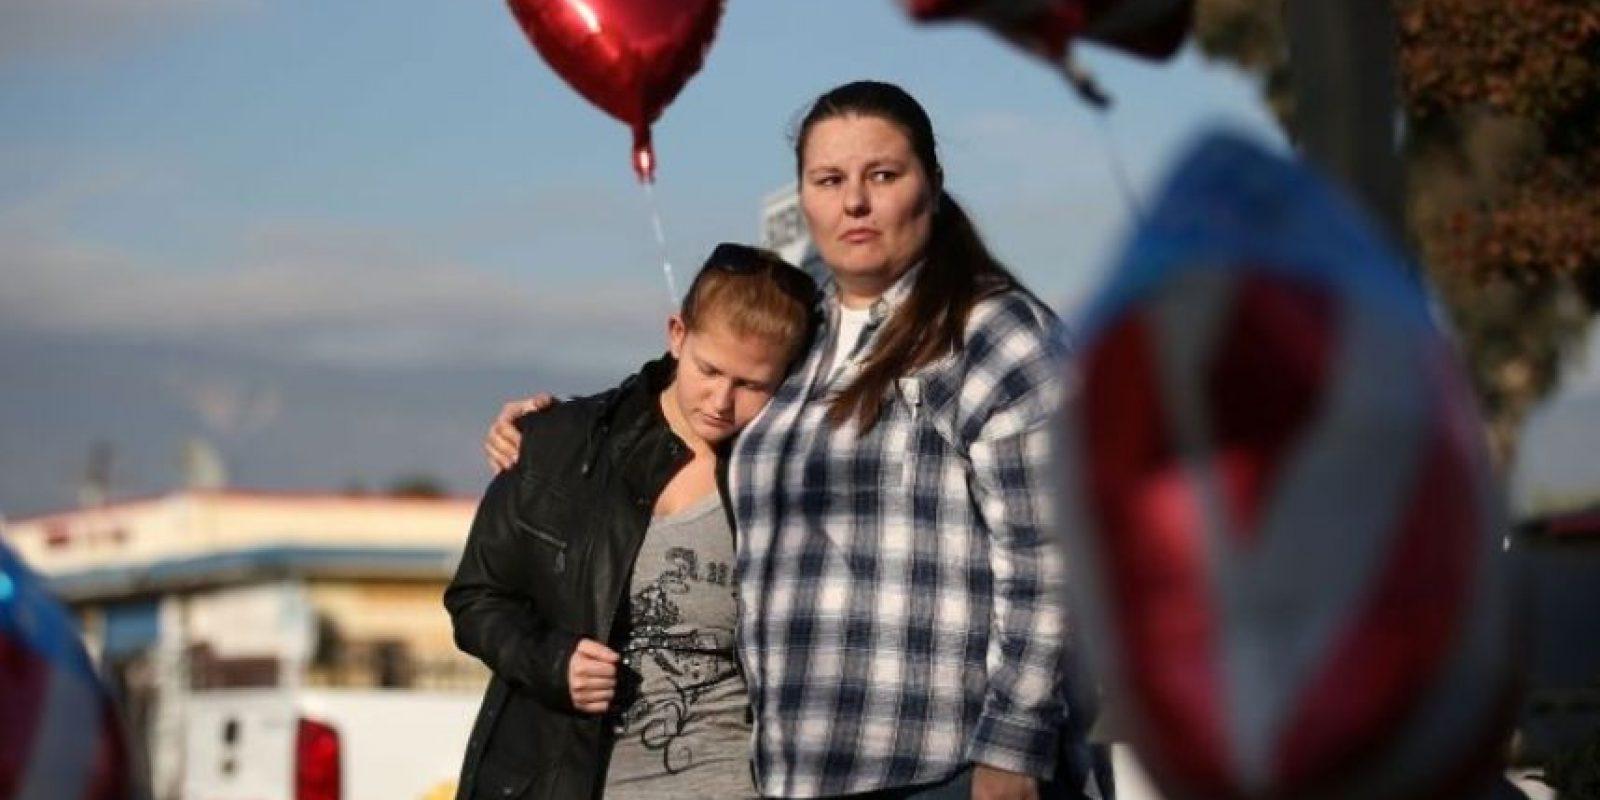 Mataron a tiros a 14 personas durante una fiesta para empleados, en San Bernardino. Foto:AFP